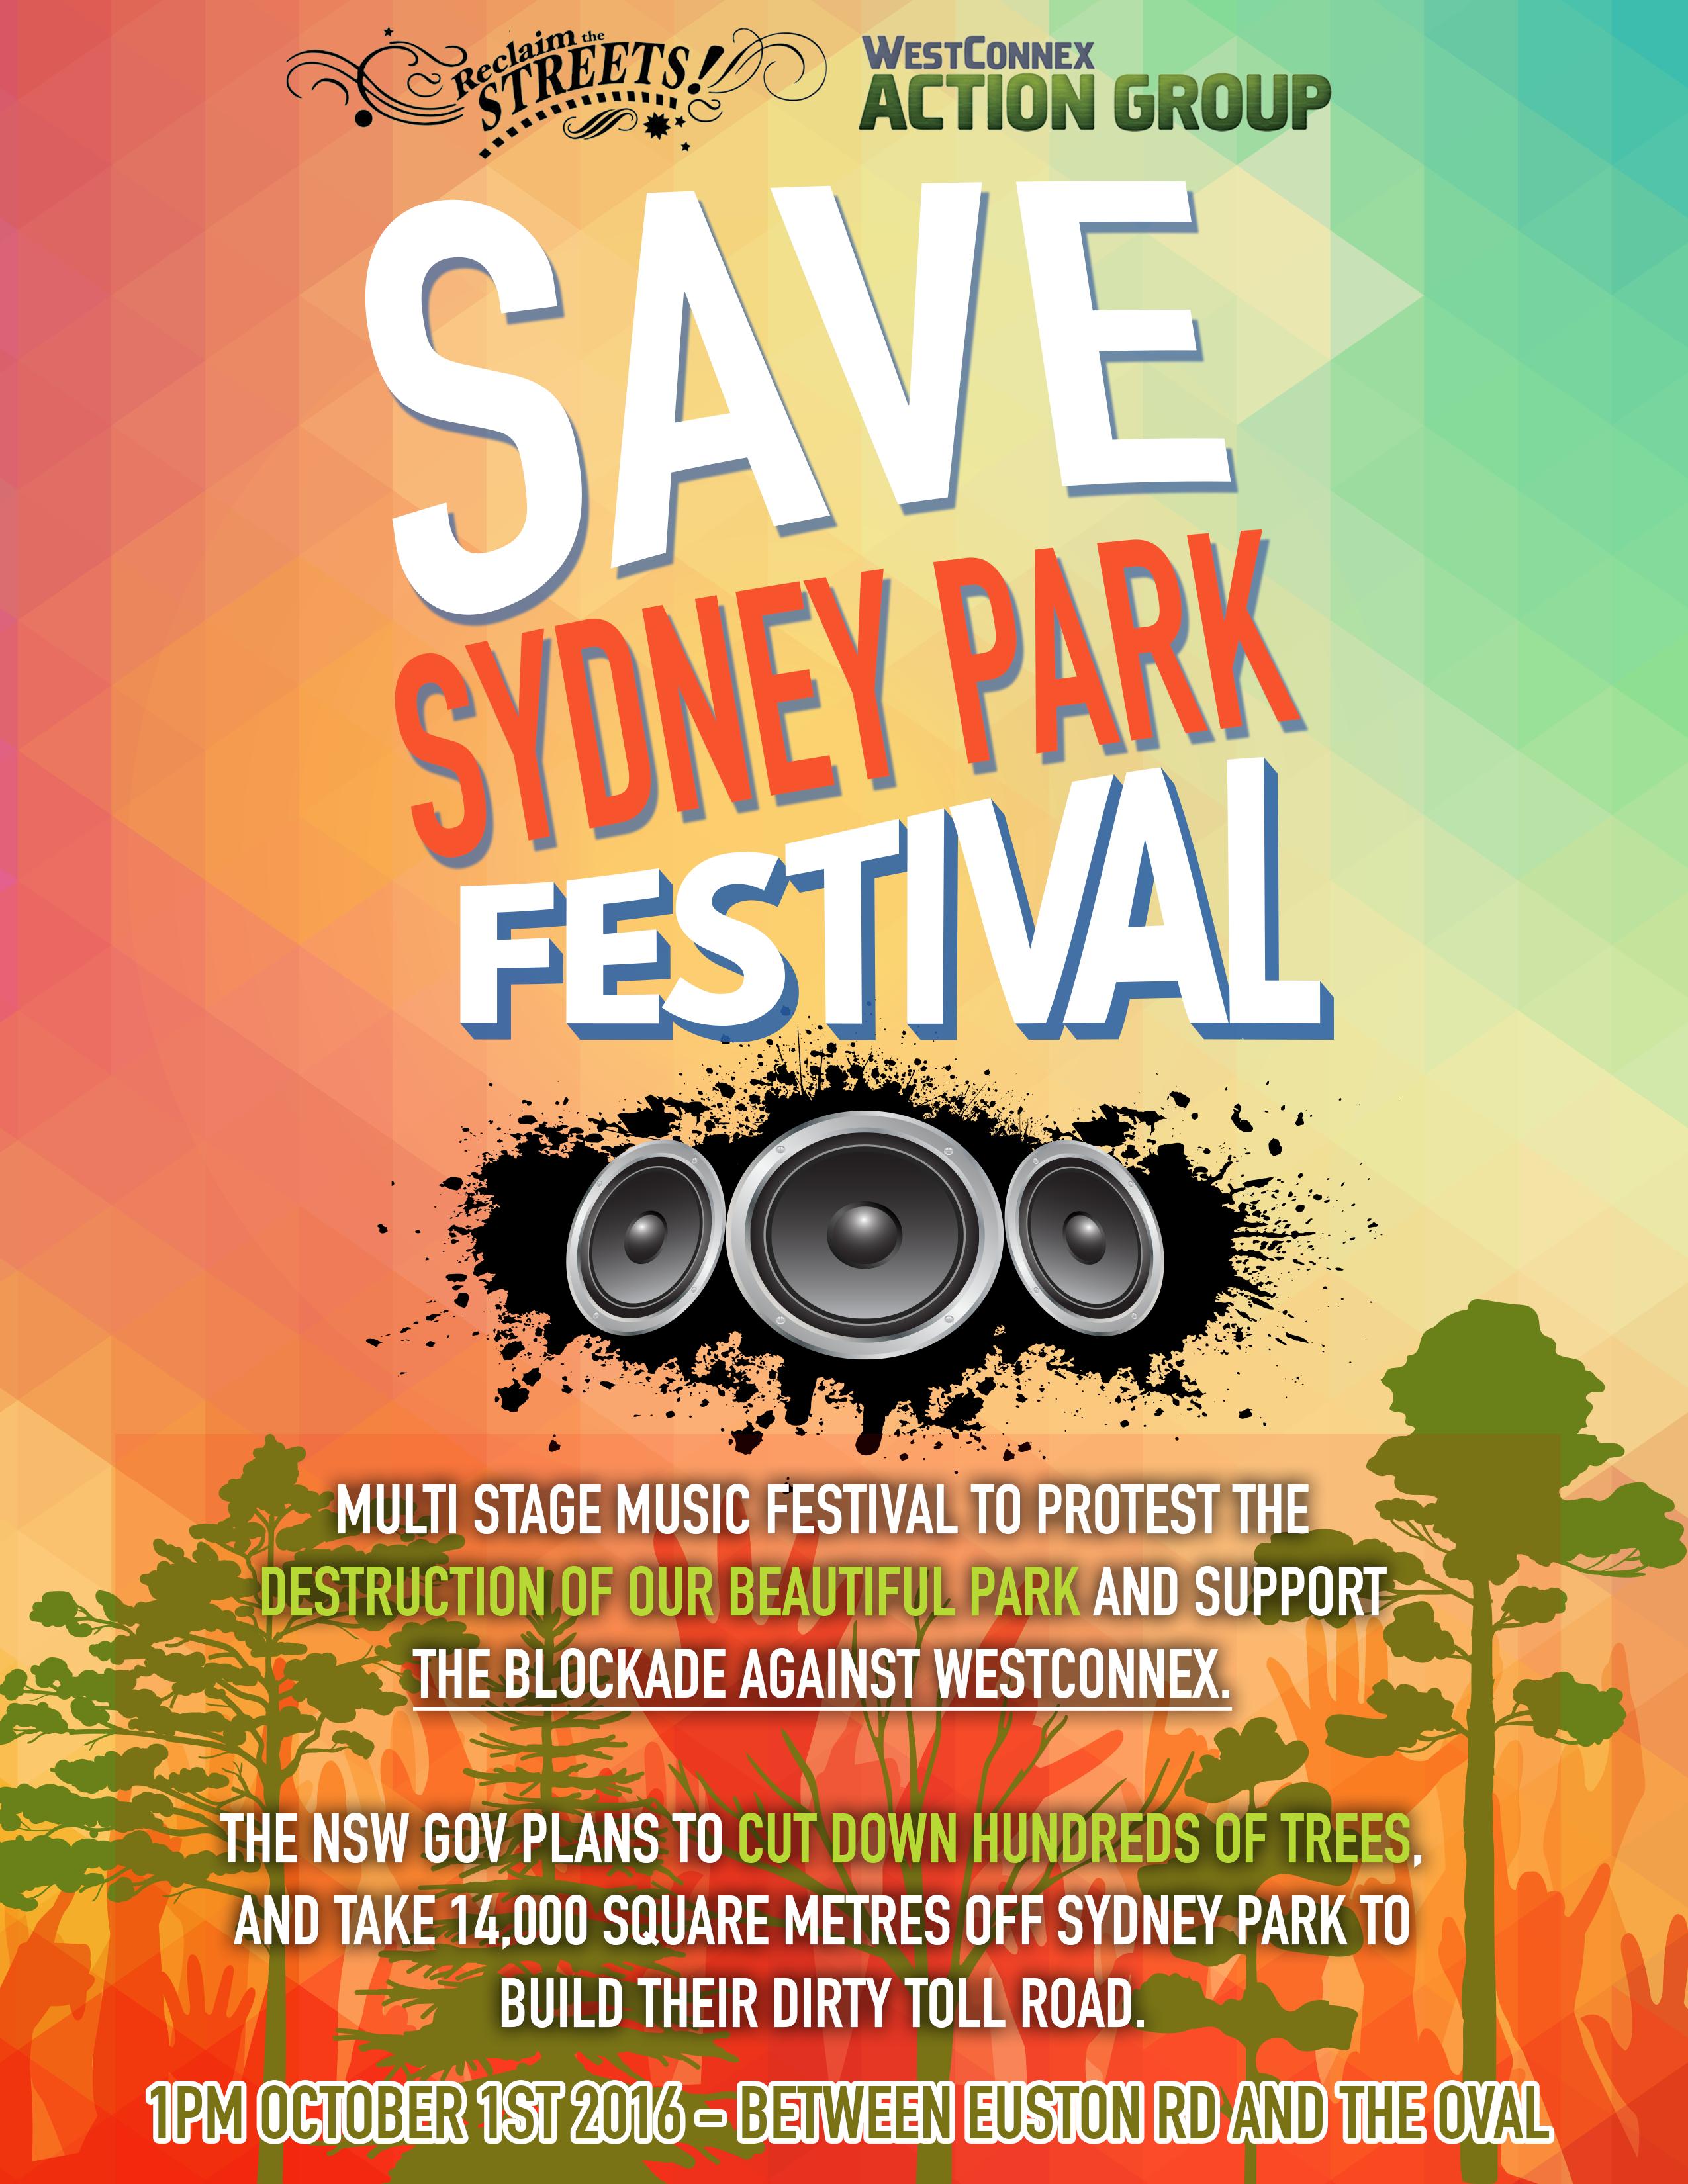 Save Sydney Park Festival poster